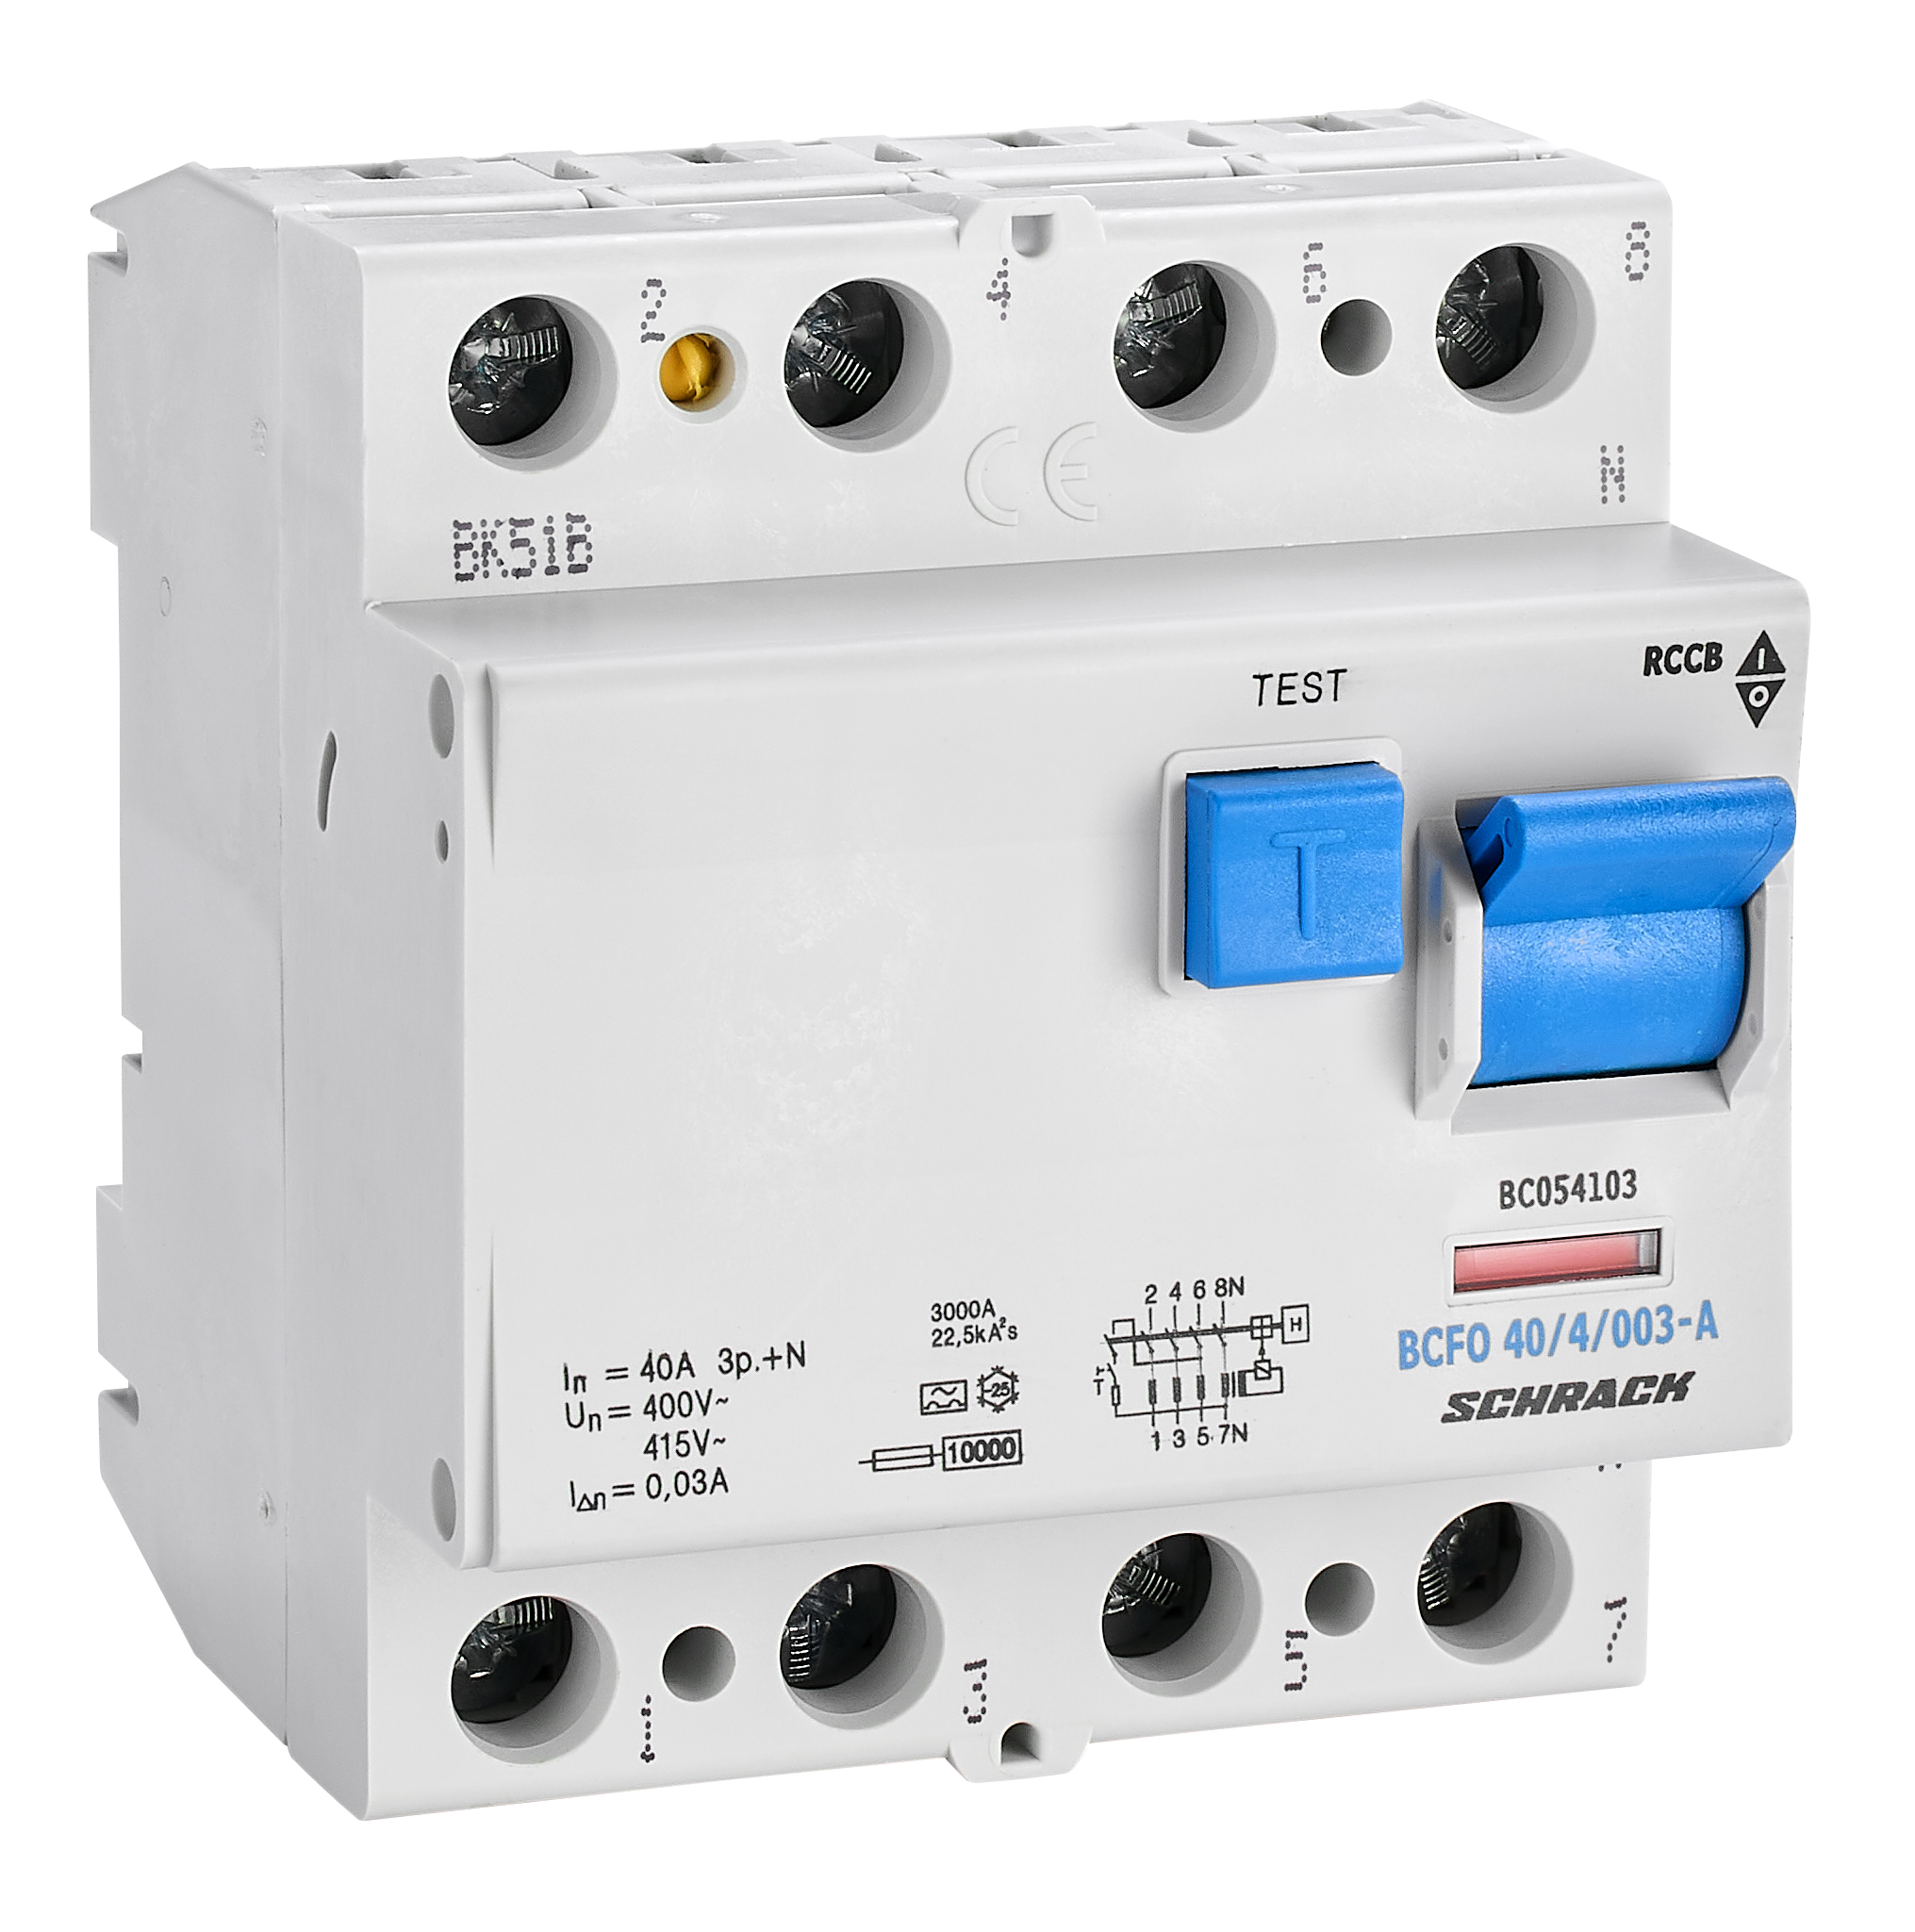 1 Stk FI-Schalter, 40A, 4-polig, 30mA, Typ A (Puls) BC054103--